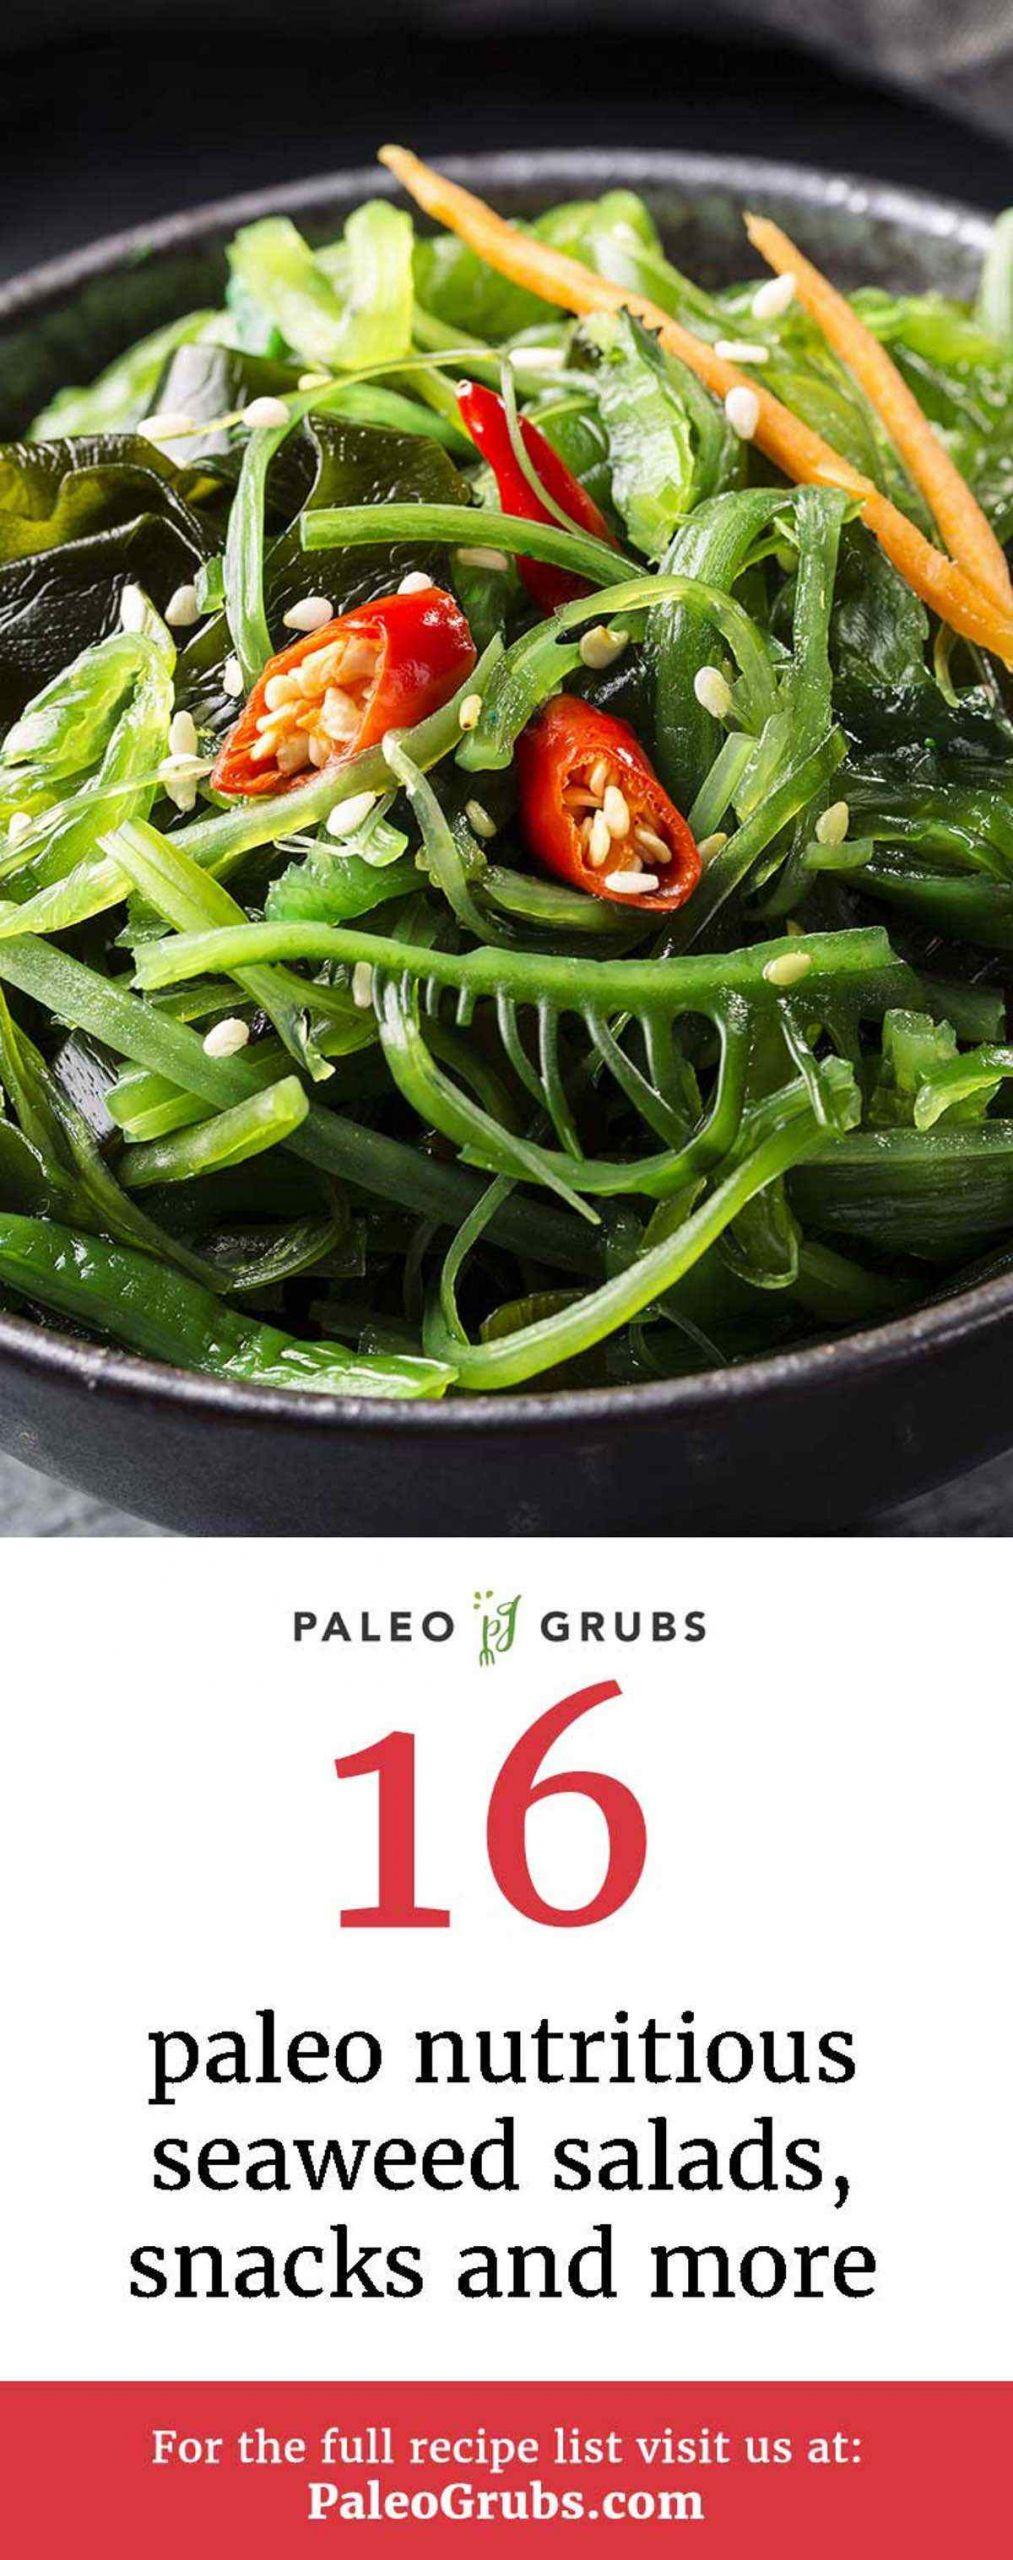 Seaweed Snacks Recipe  16 Paleo Nutritious Seaweed Salads Snacks and More